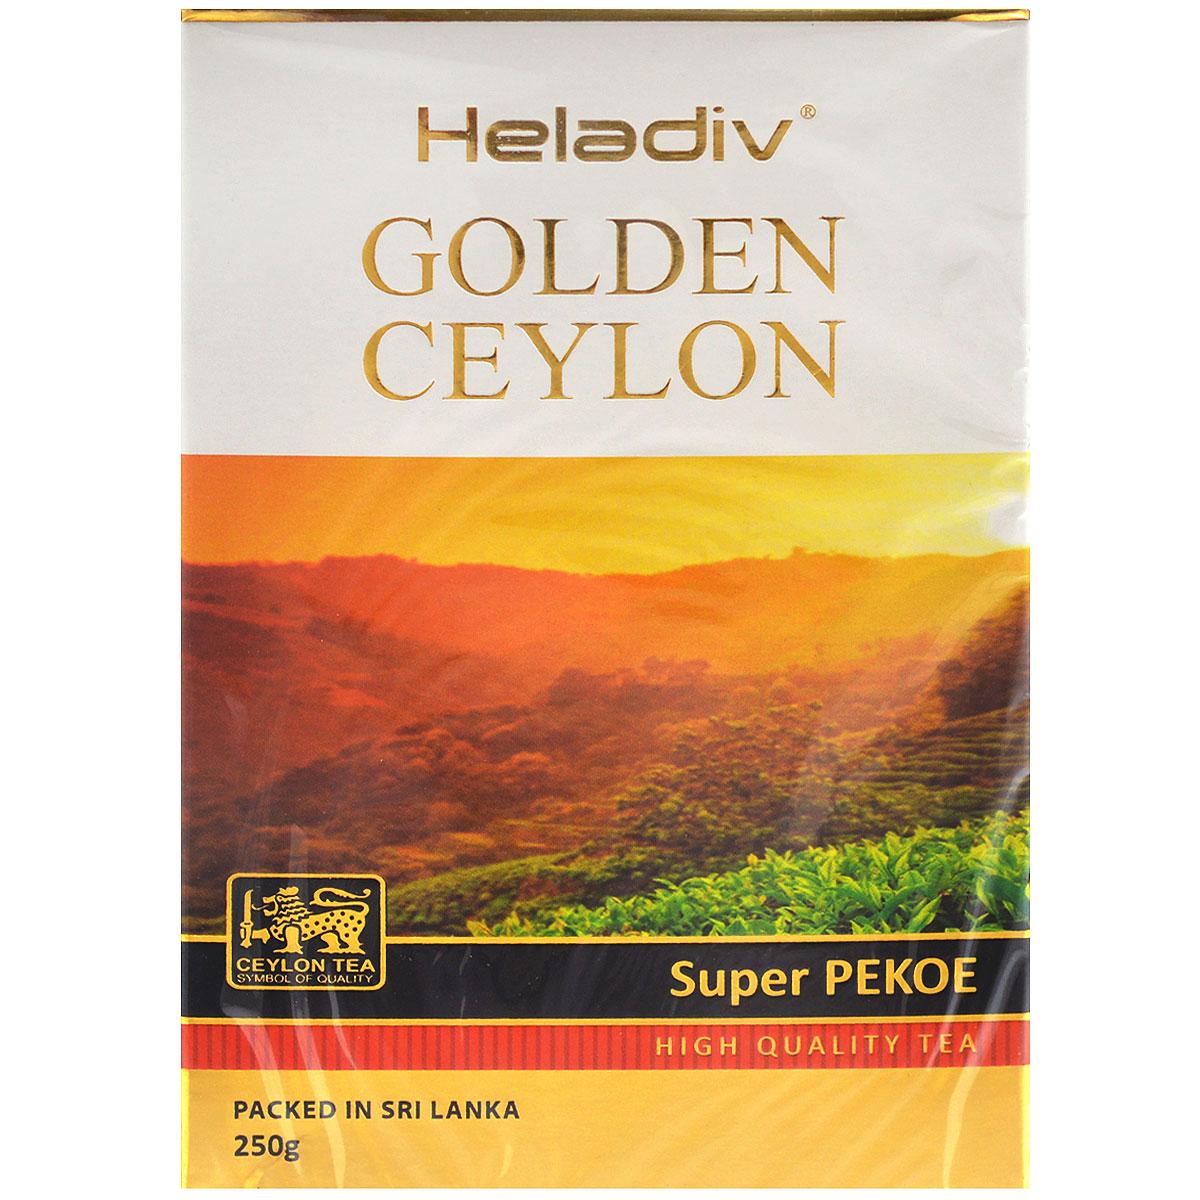 Heladiv Golden Ceylon Super Pekoe черный листовой чай, 250 г чай heladiv чай черный листовой heladiv pekoe 400г